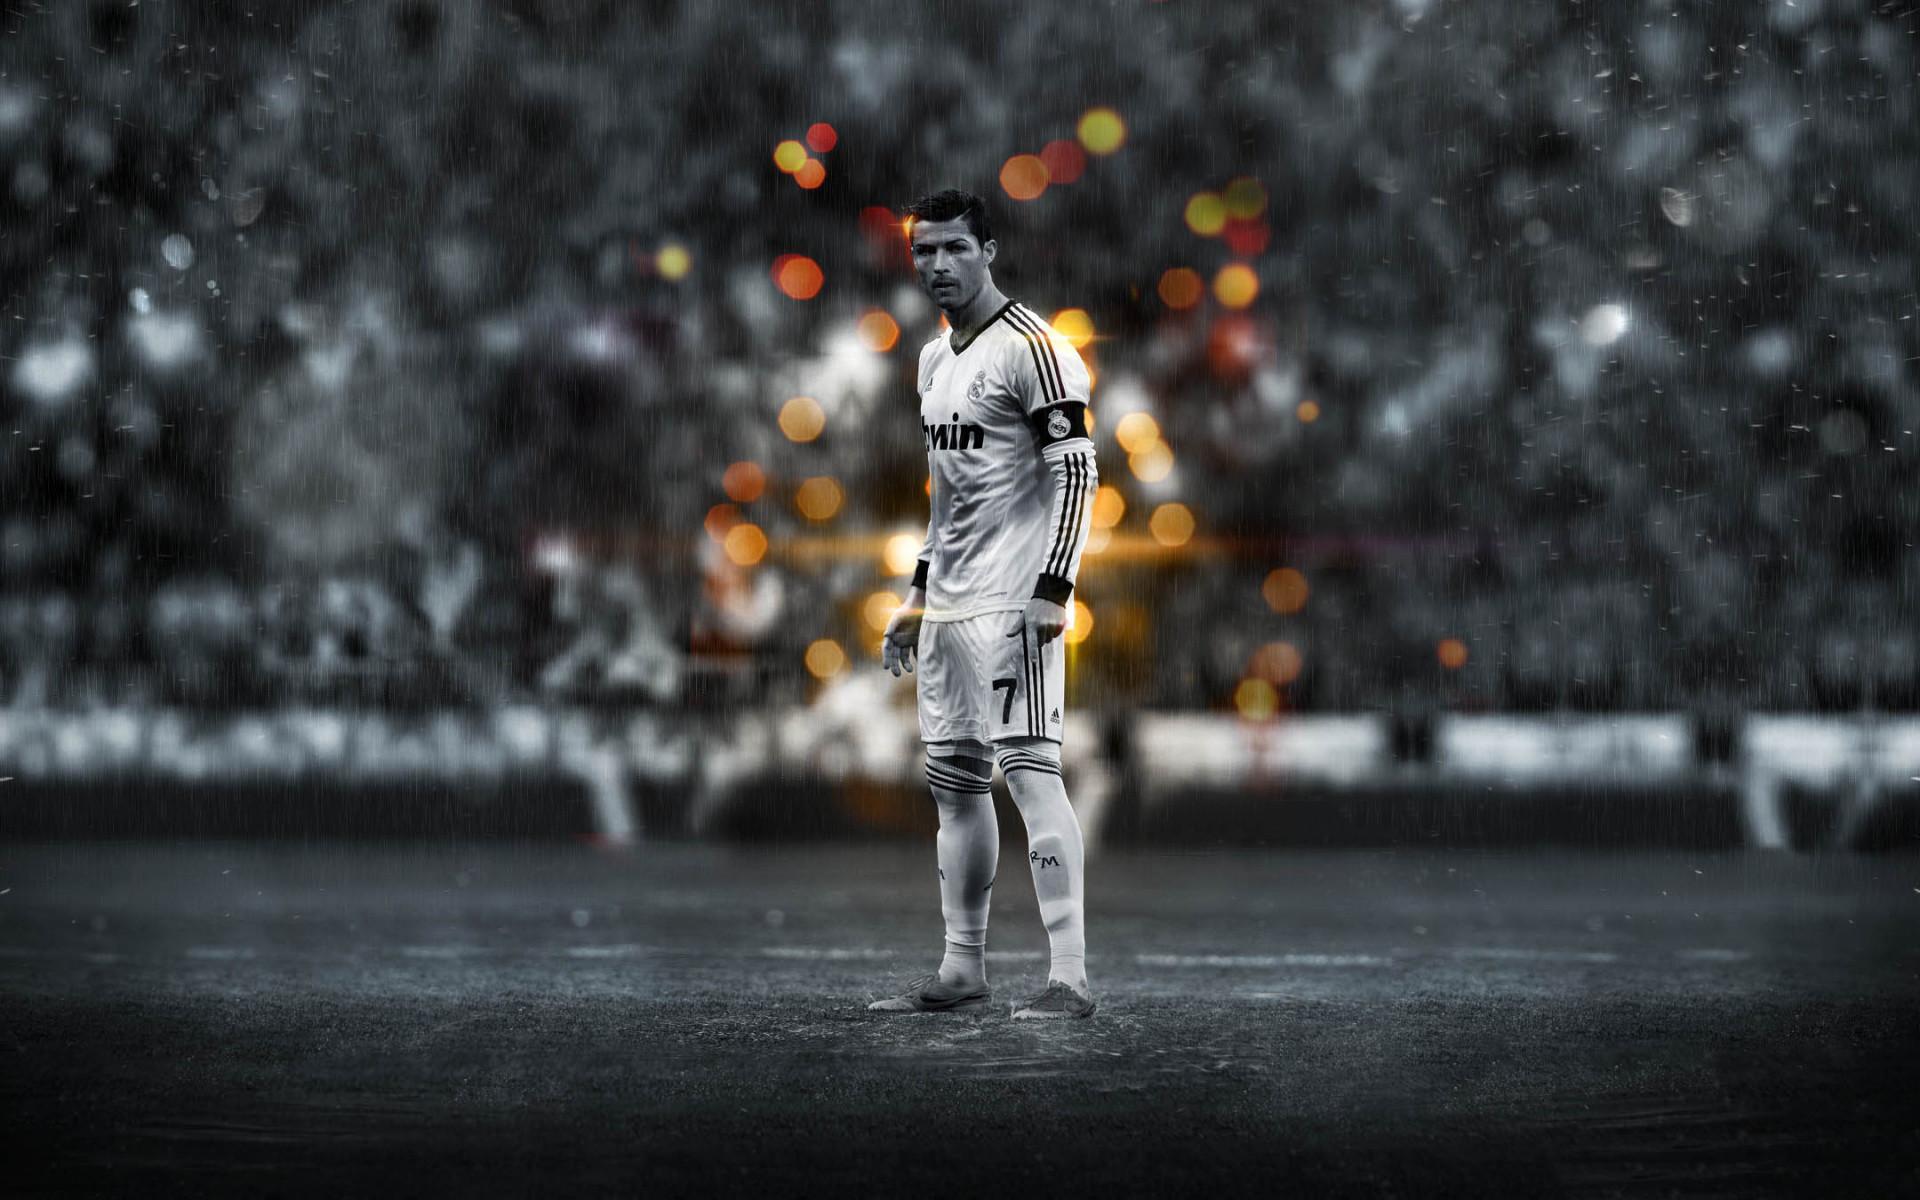 Res: 1920x1200, Christiano Ronaldo Real Madrid Field Shot Desktop Wallpaper Uploaded by  10Mantra